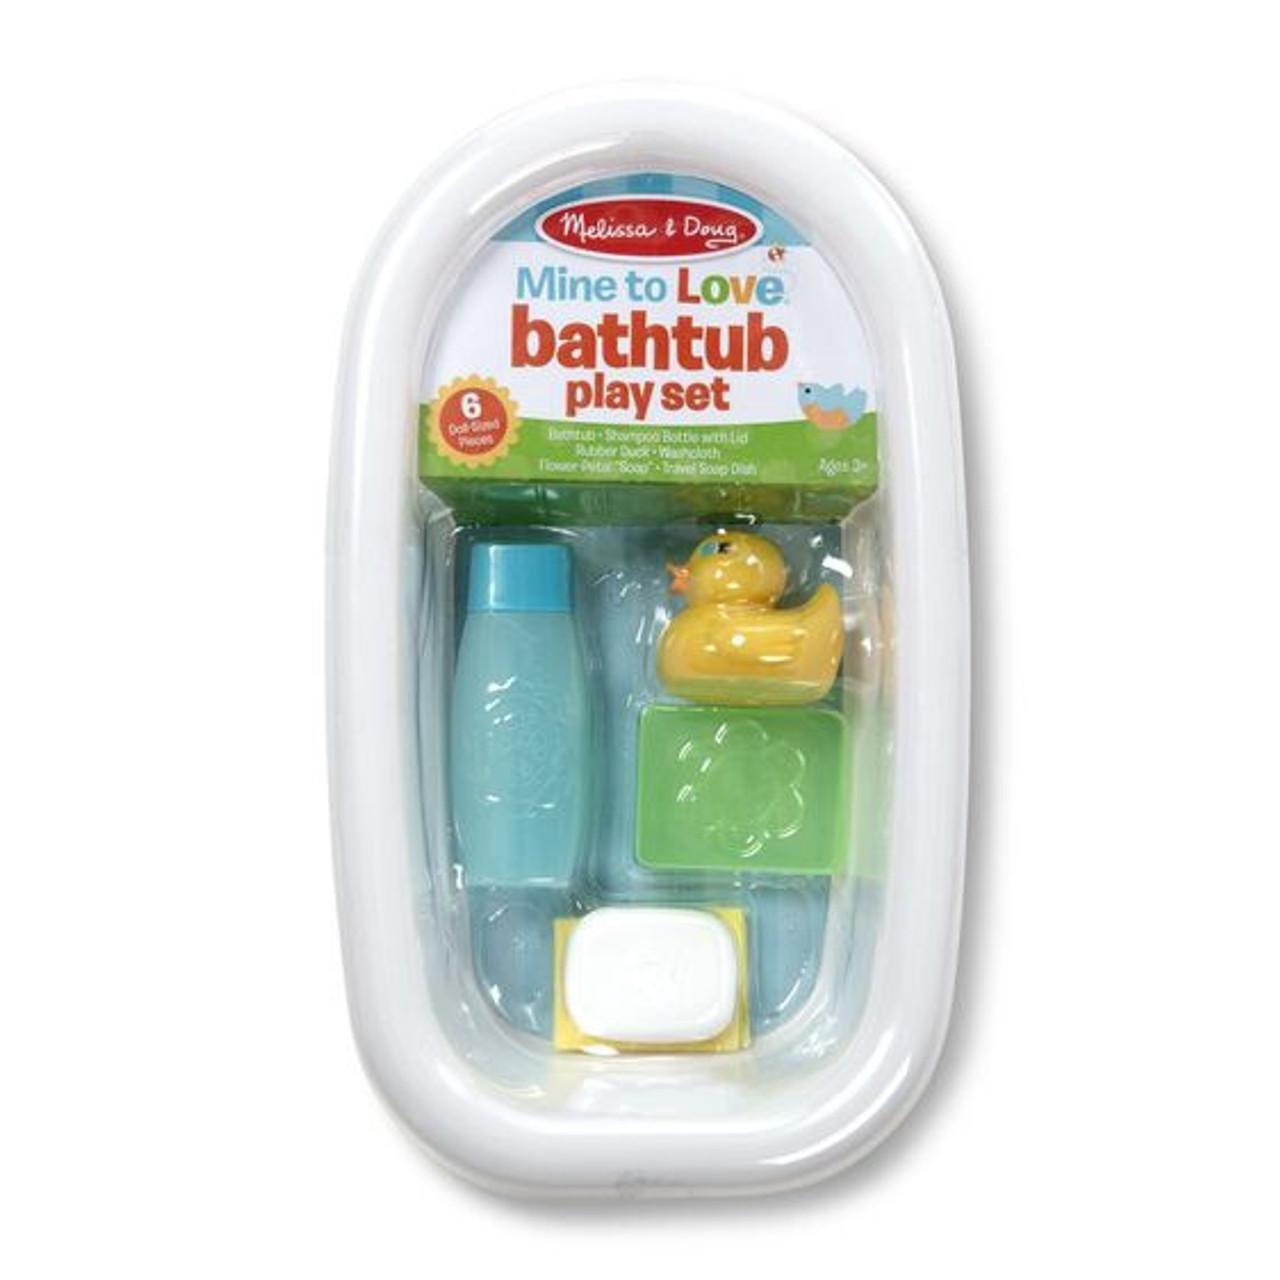 MINE TO LOVE BATHTUB PLAY SET-WHITE